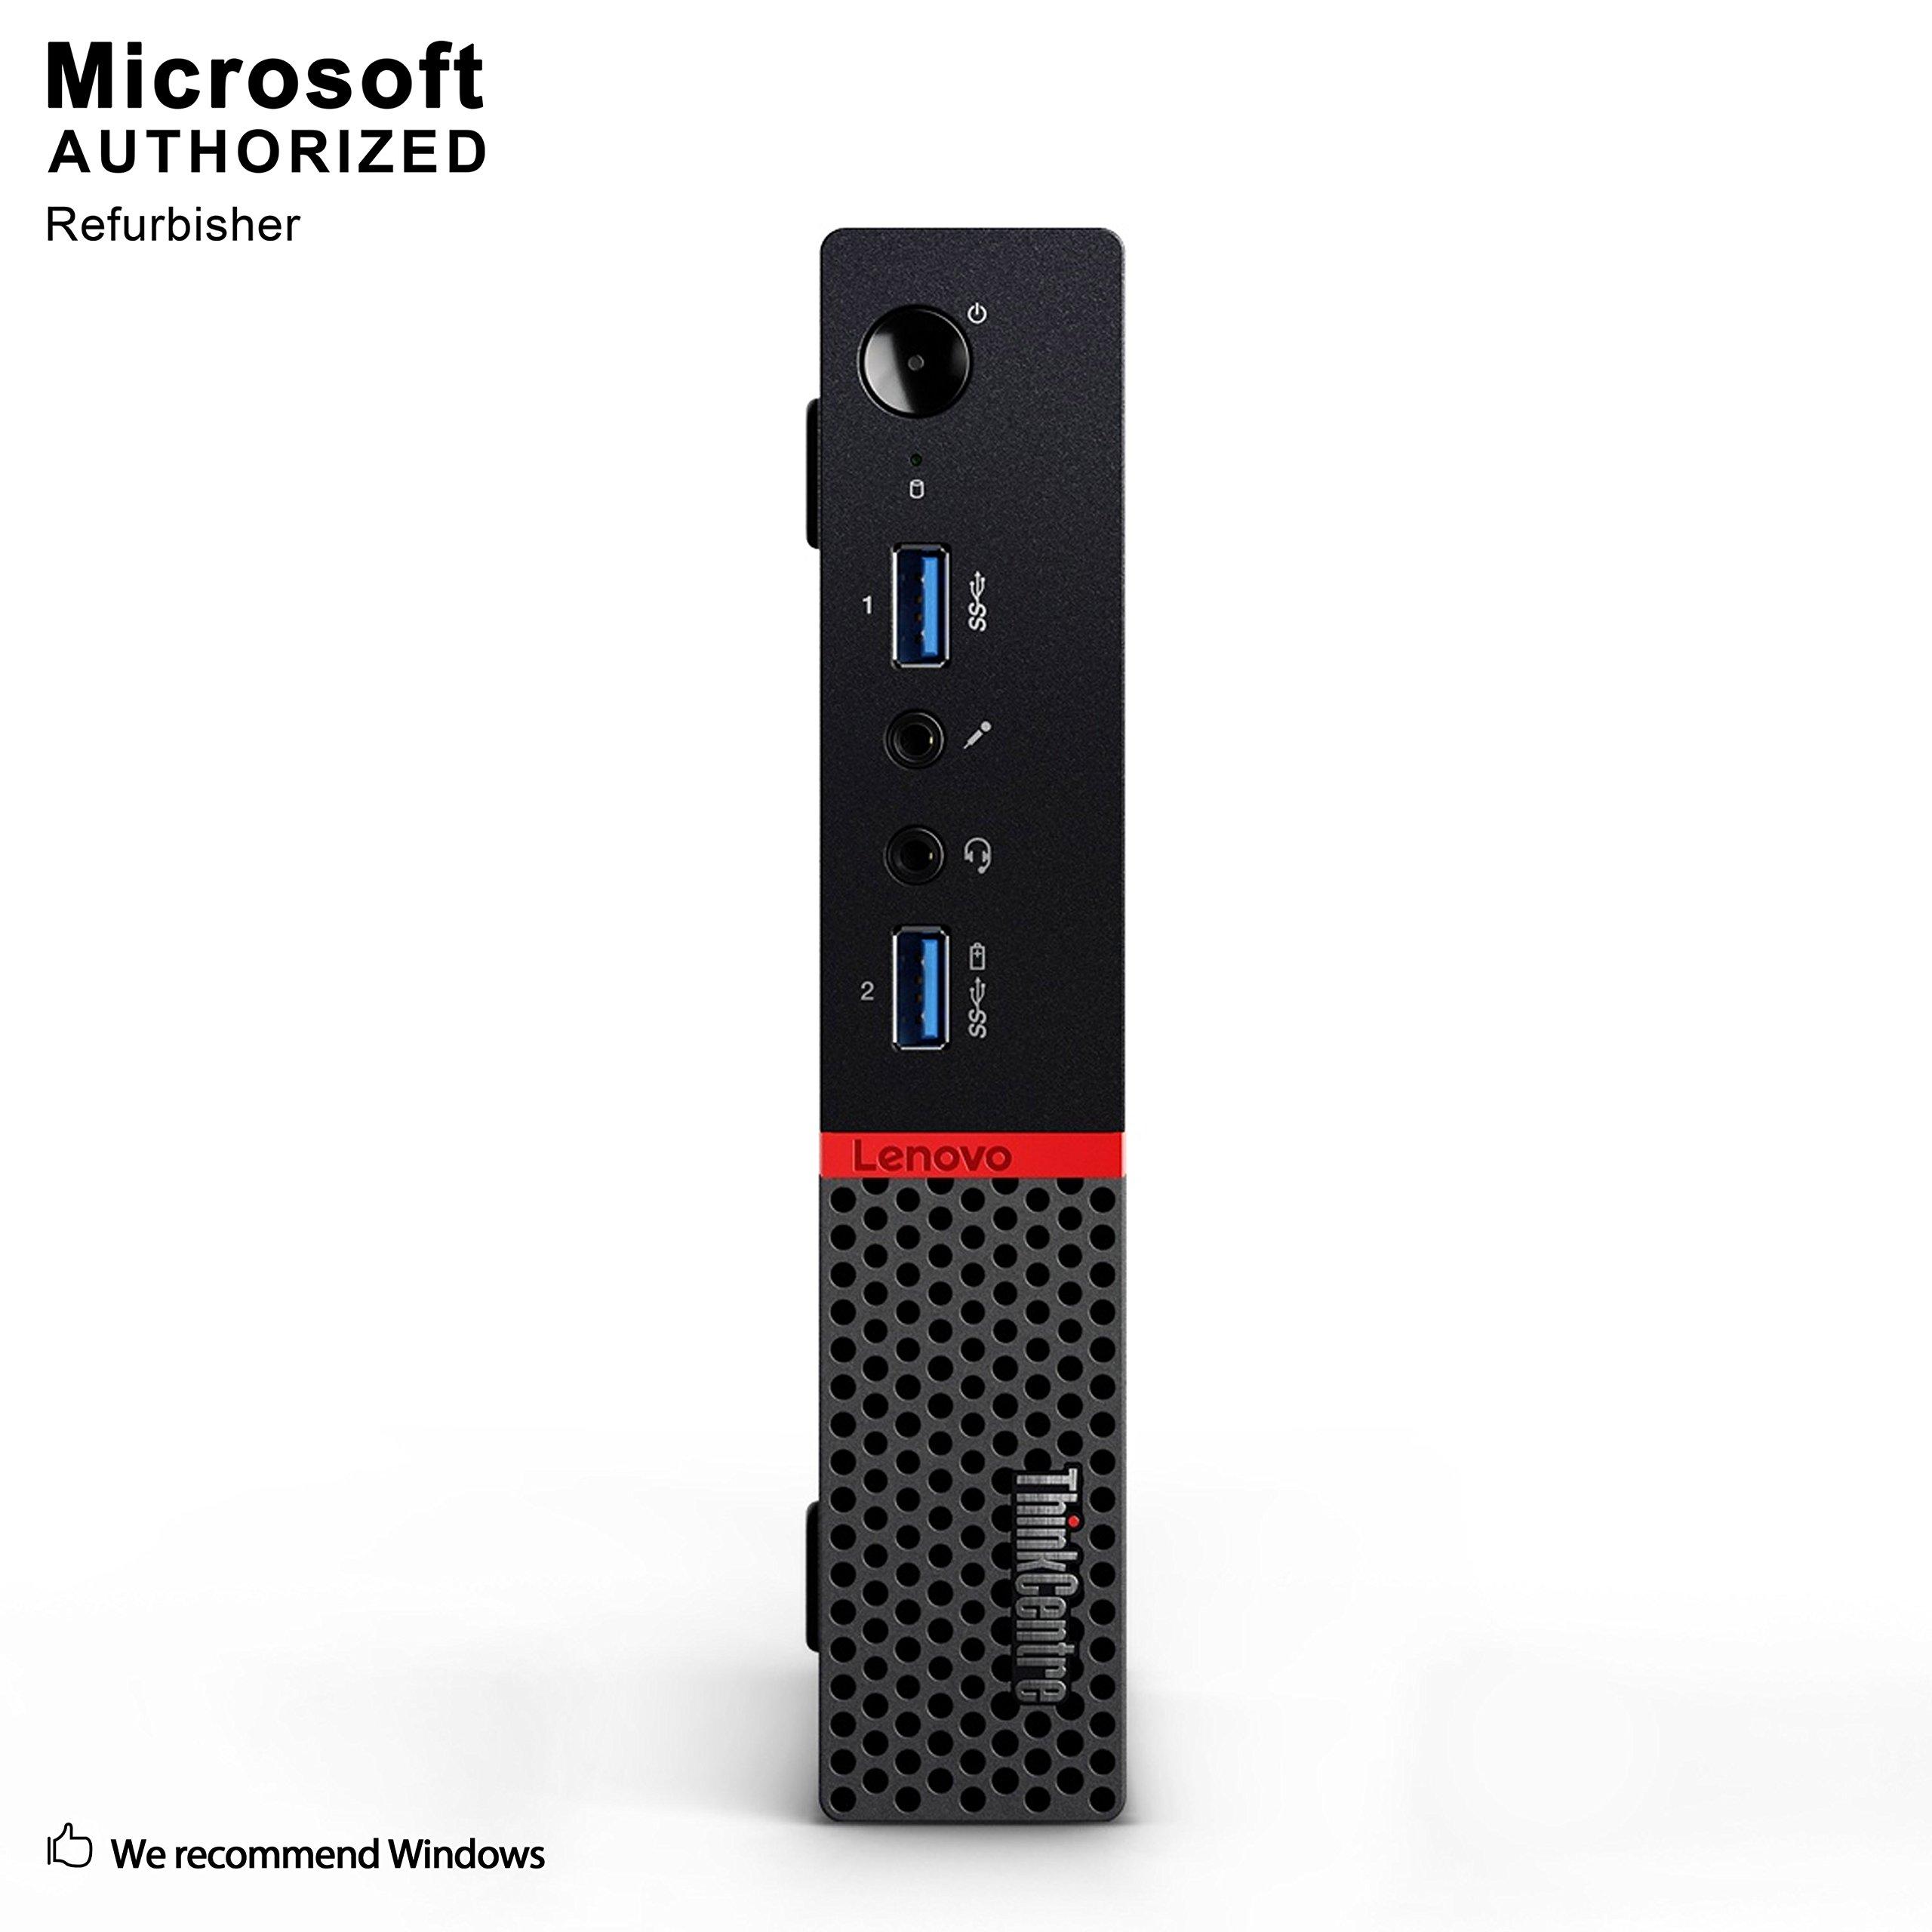 Lenovo ThinkCentre M700 Tiny Business Desktop PC Bluetooth 4.0 WiFi 16G DDR4 1T Intel Quad Core i7-6700T up to 3.6GHz Renewed Windows 10 64-Multi-Language Support English//Spanish//French